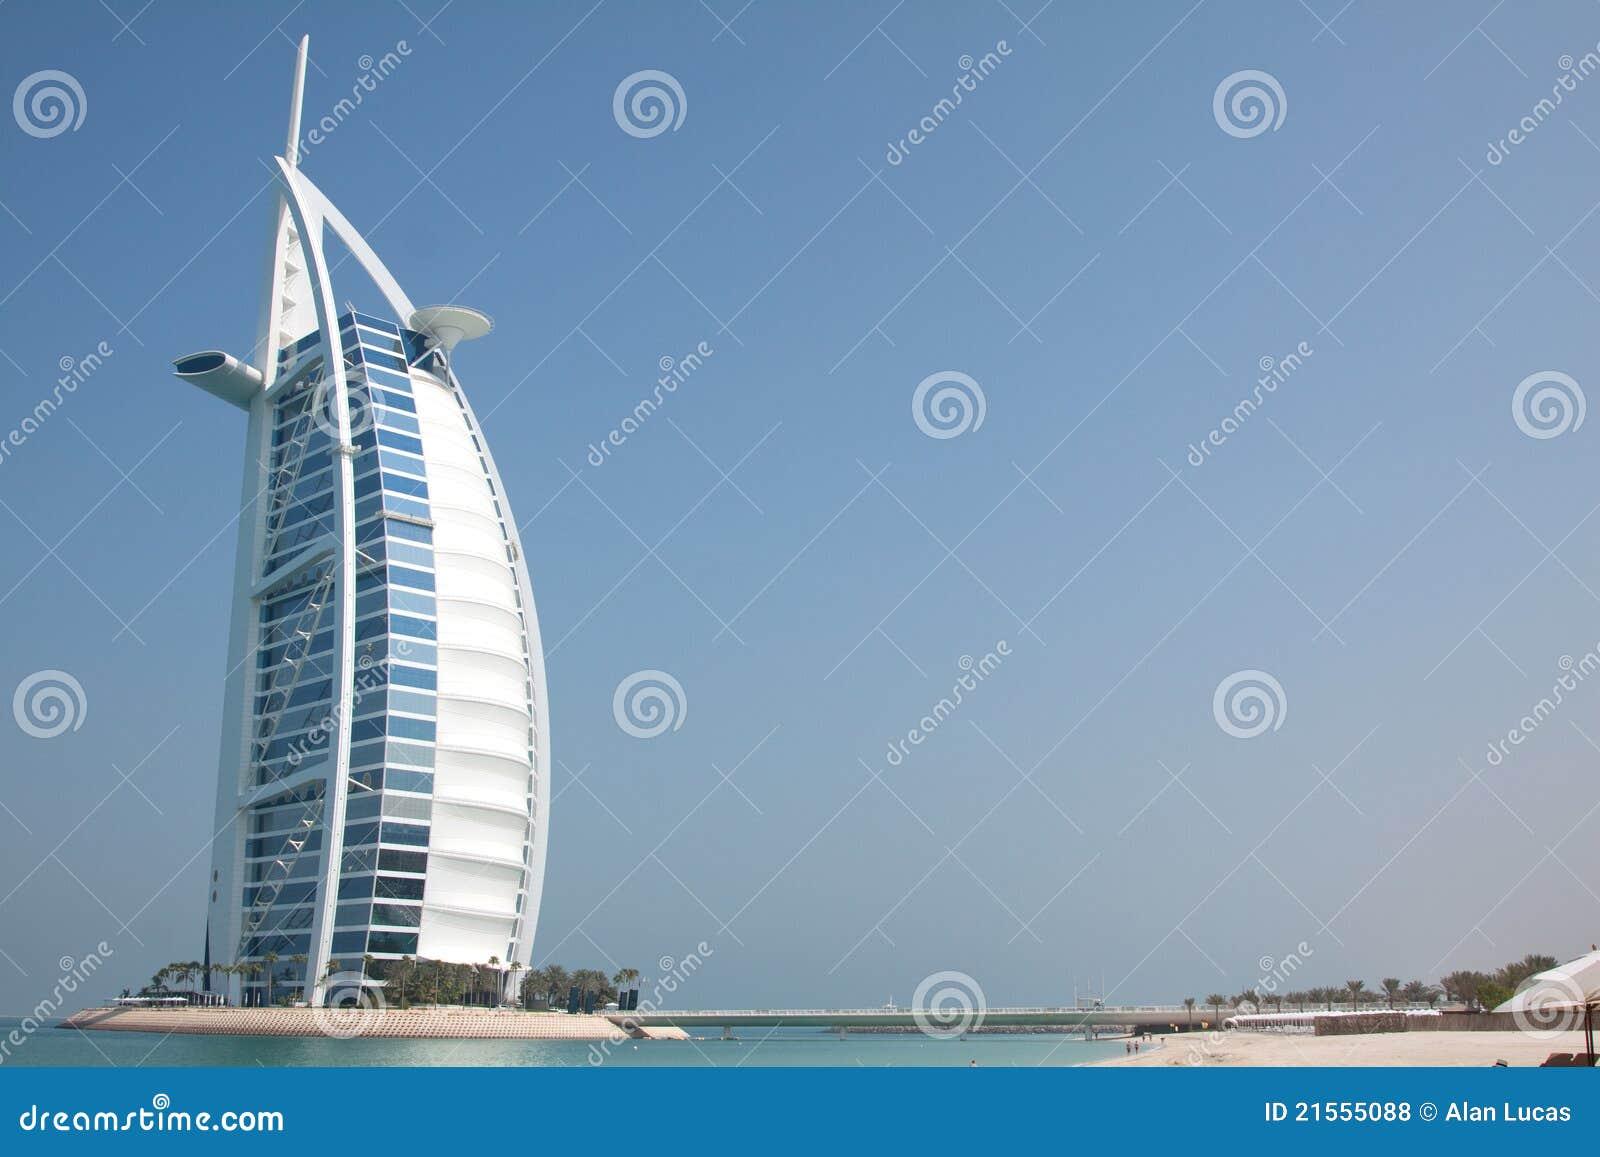 Burj al arab hotel royalty free stock photos image 21555088 for Super luxury hotels in dubai